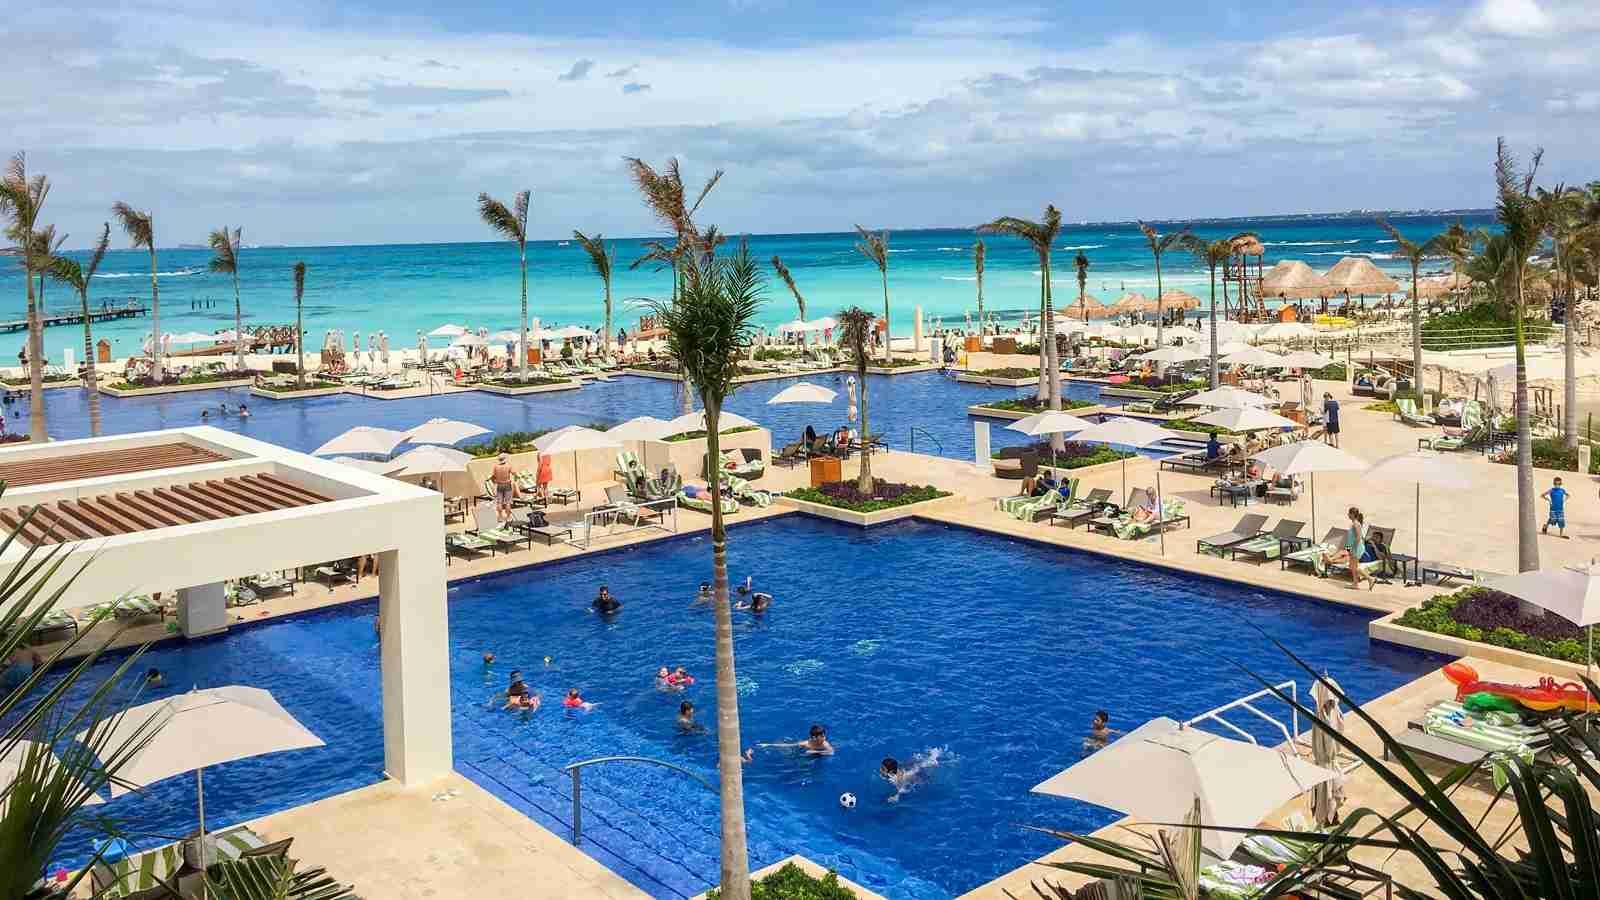 Hyatt Ziva Cancun (Photo by Summer Hull/The Points Guy)